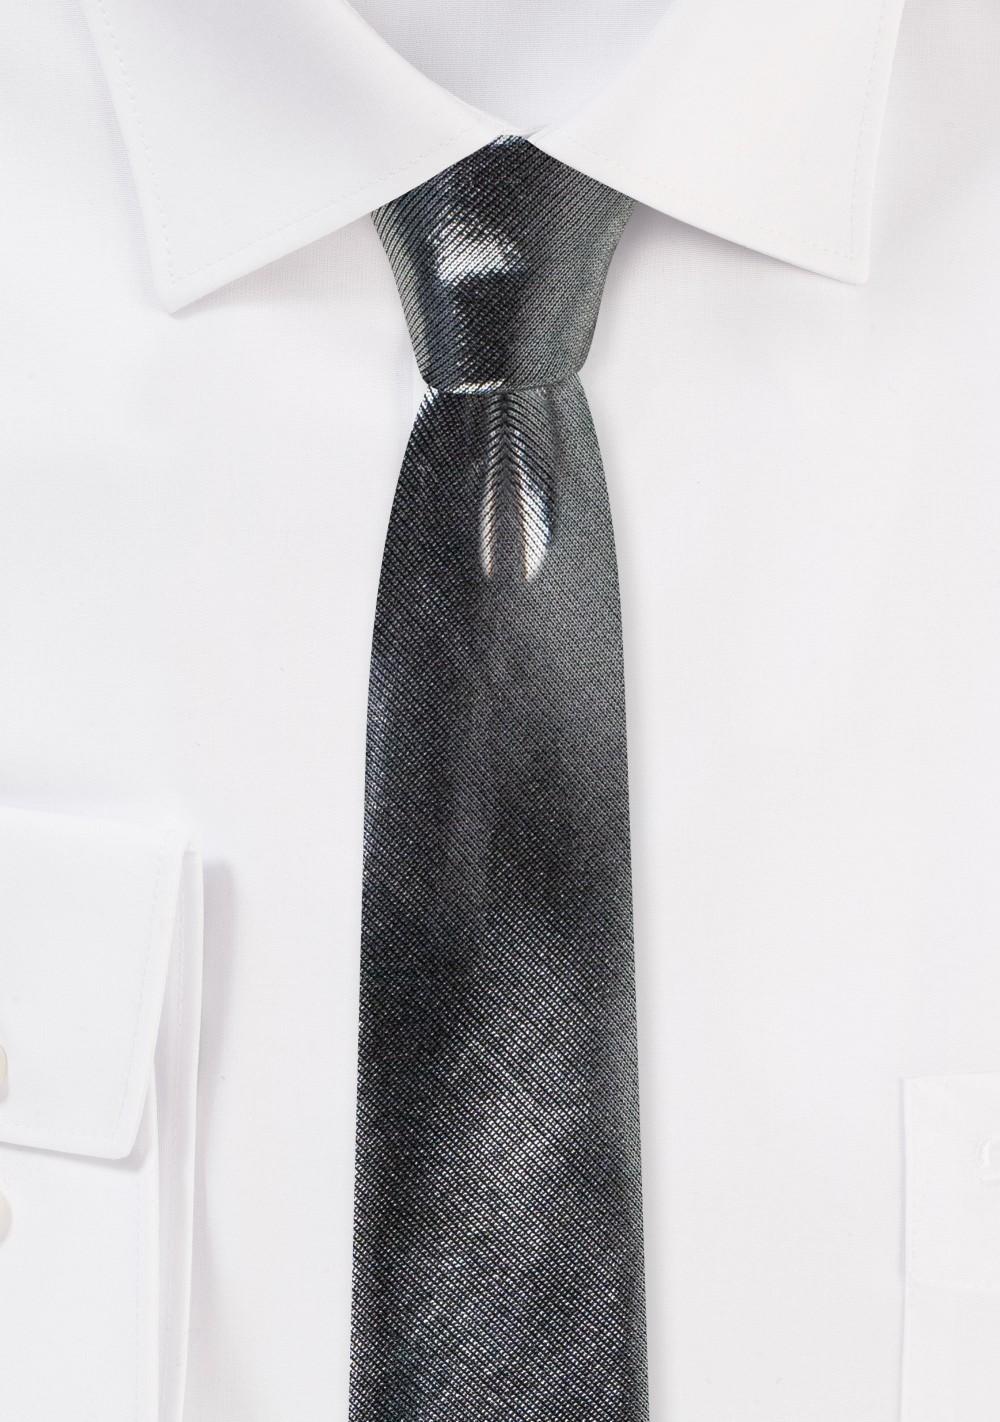 Metallic Skinny Tie in Shiny Silver